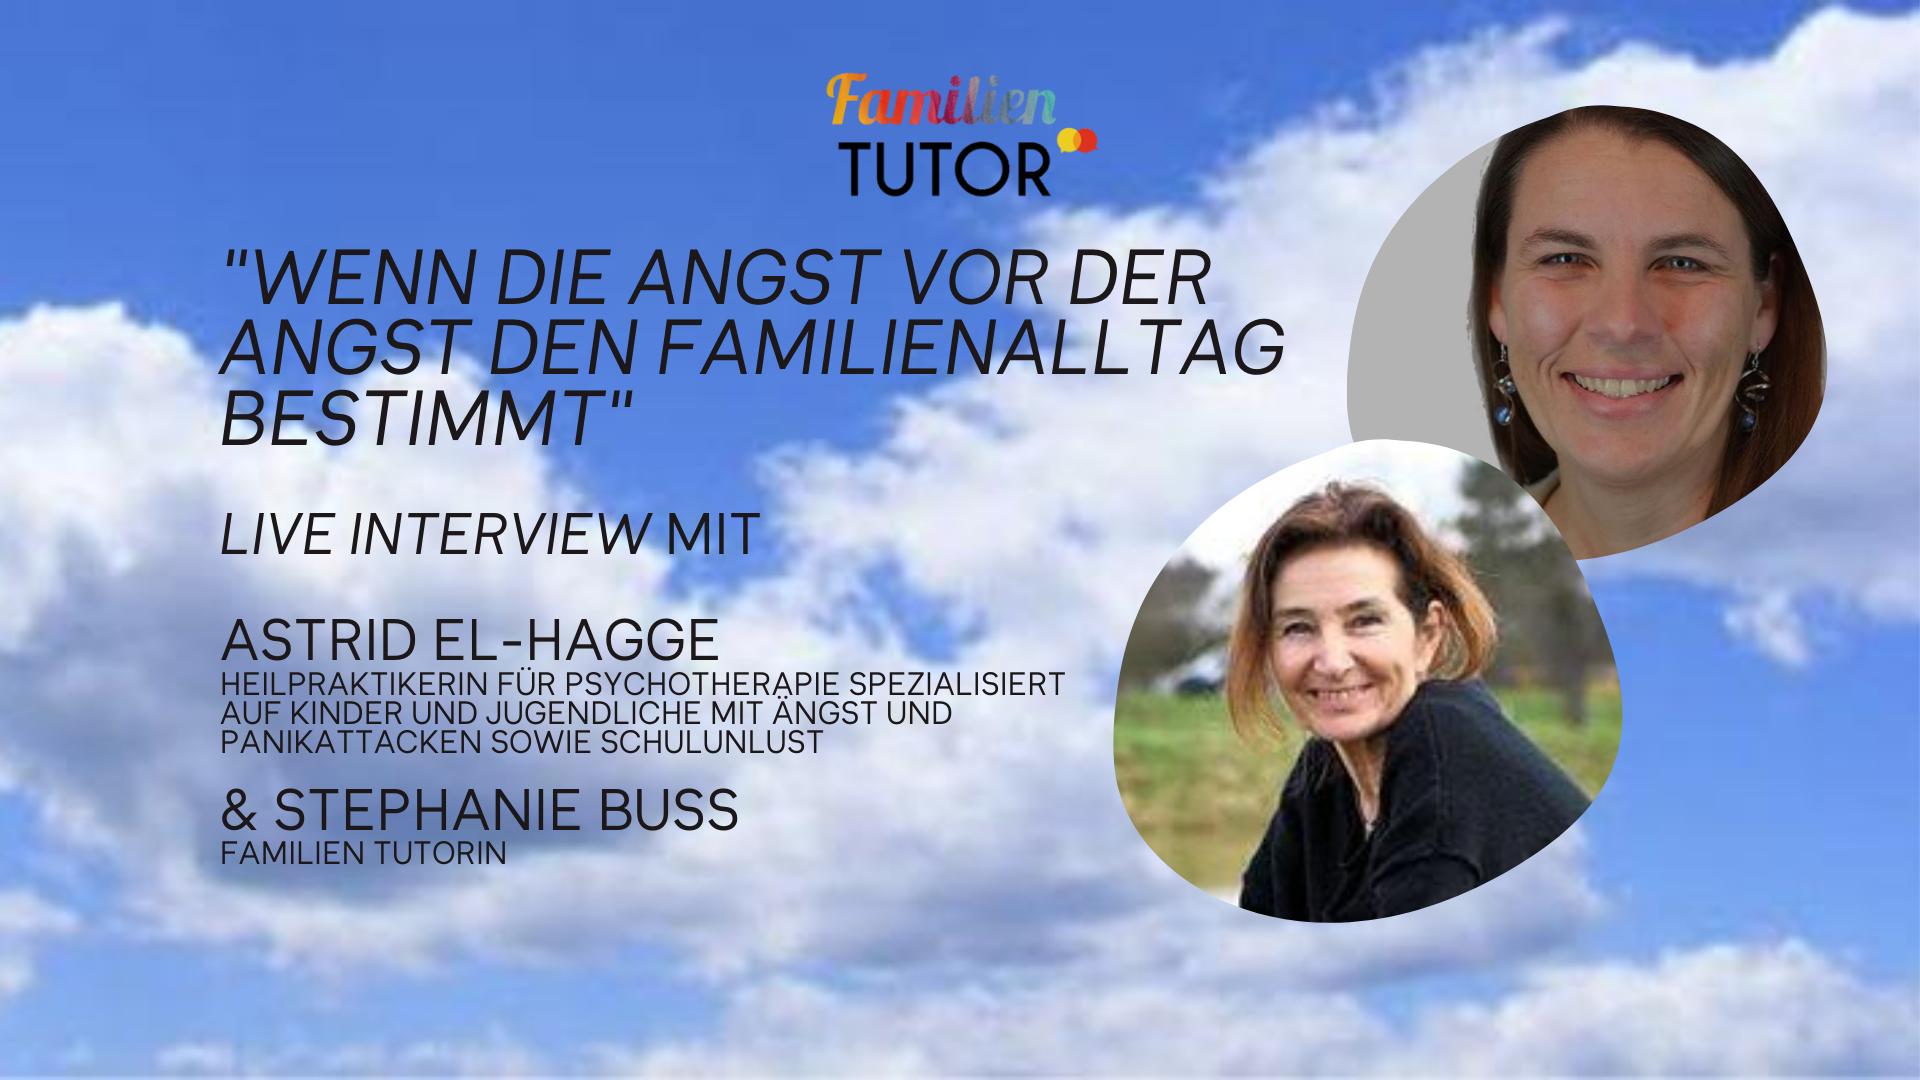 Family Friday Tutorial mit Astrid El-Hagge